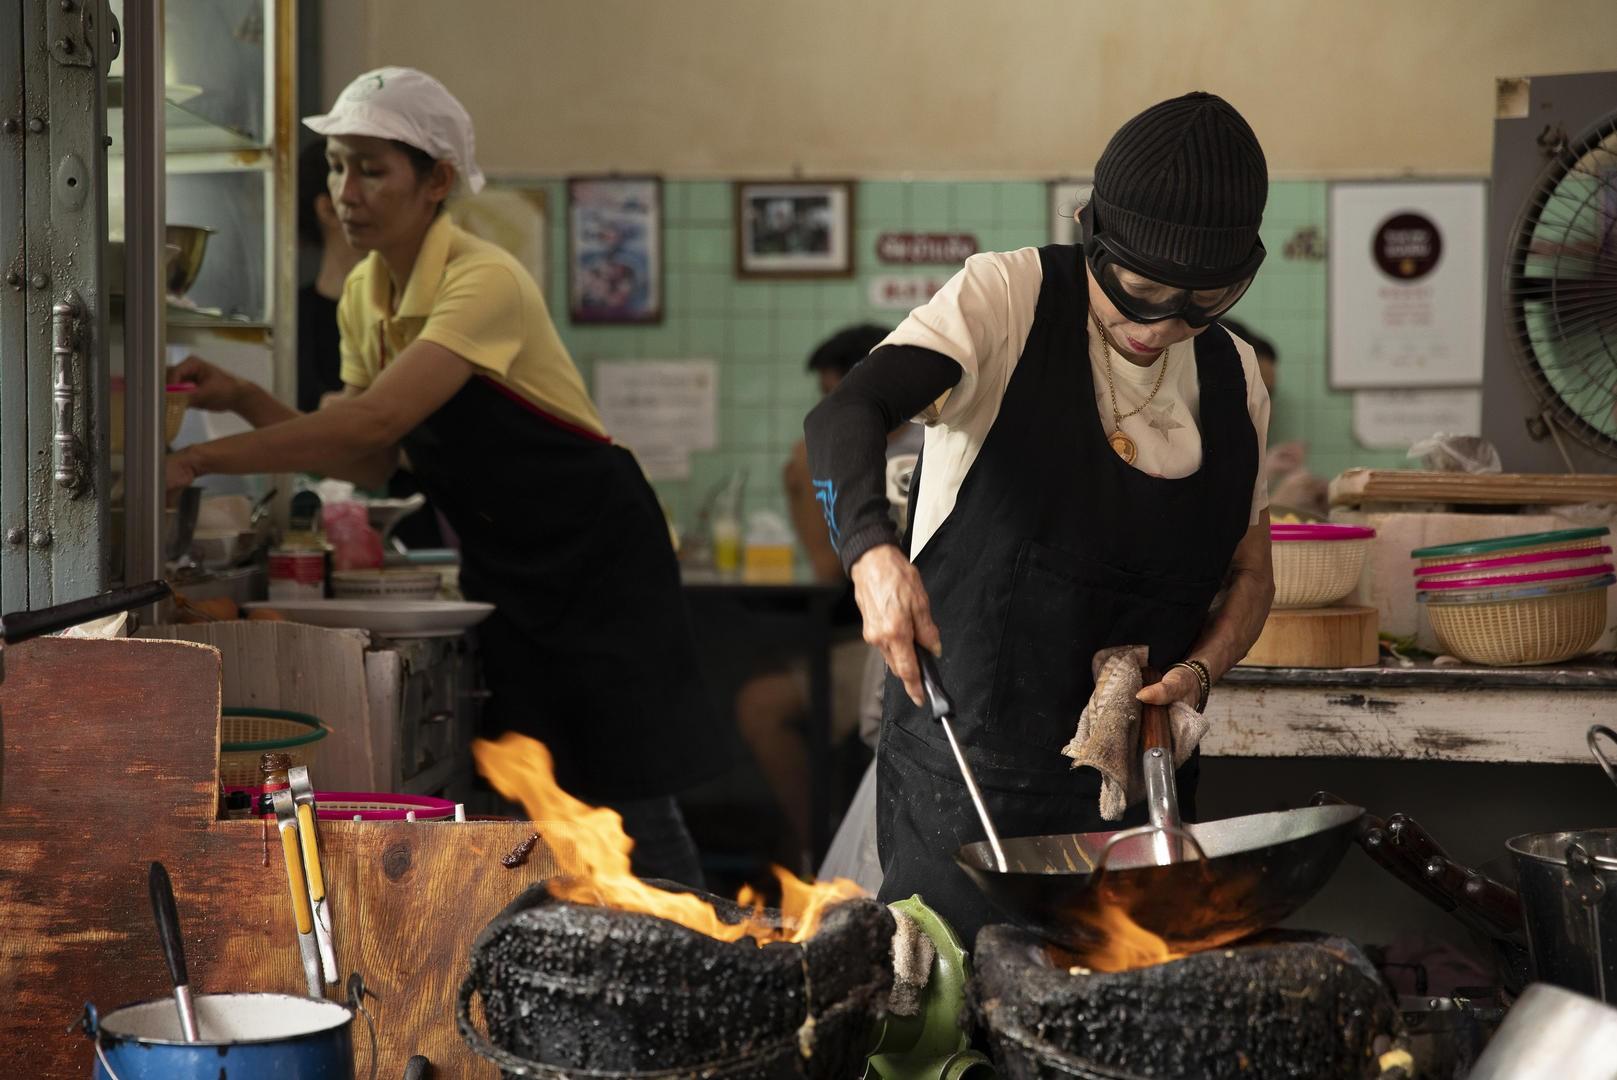 Street Food, série documental da Netflix (Foto: Divulgação/Netflix)